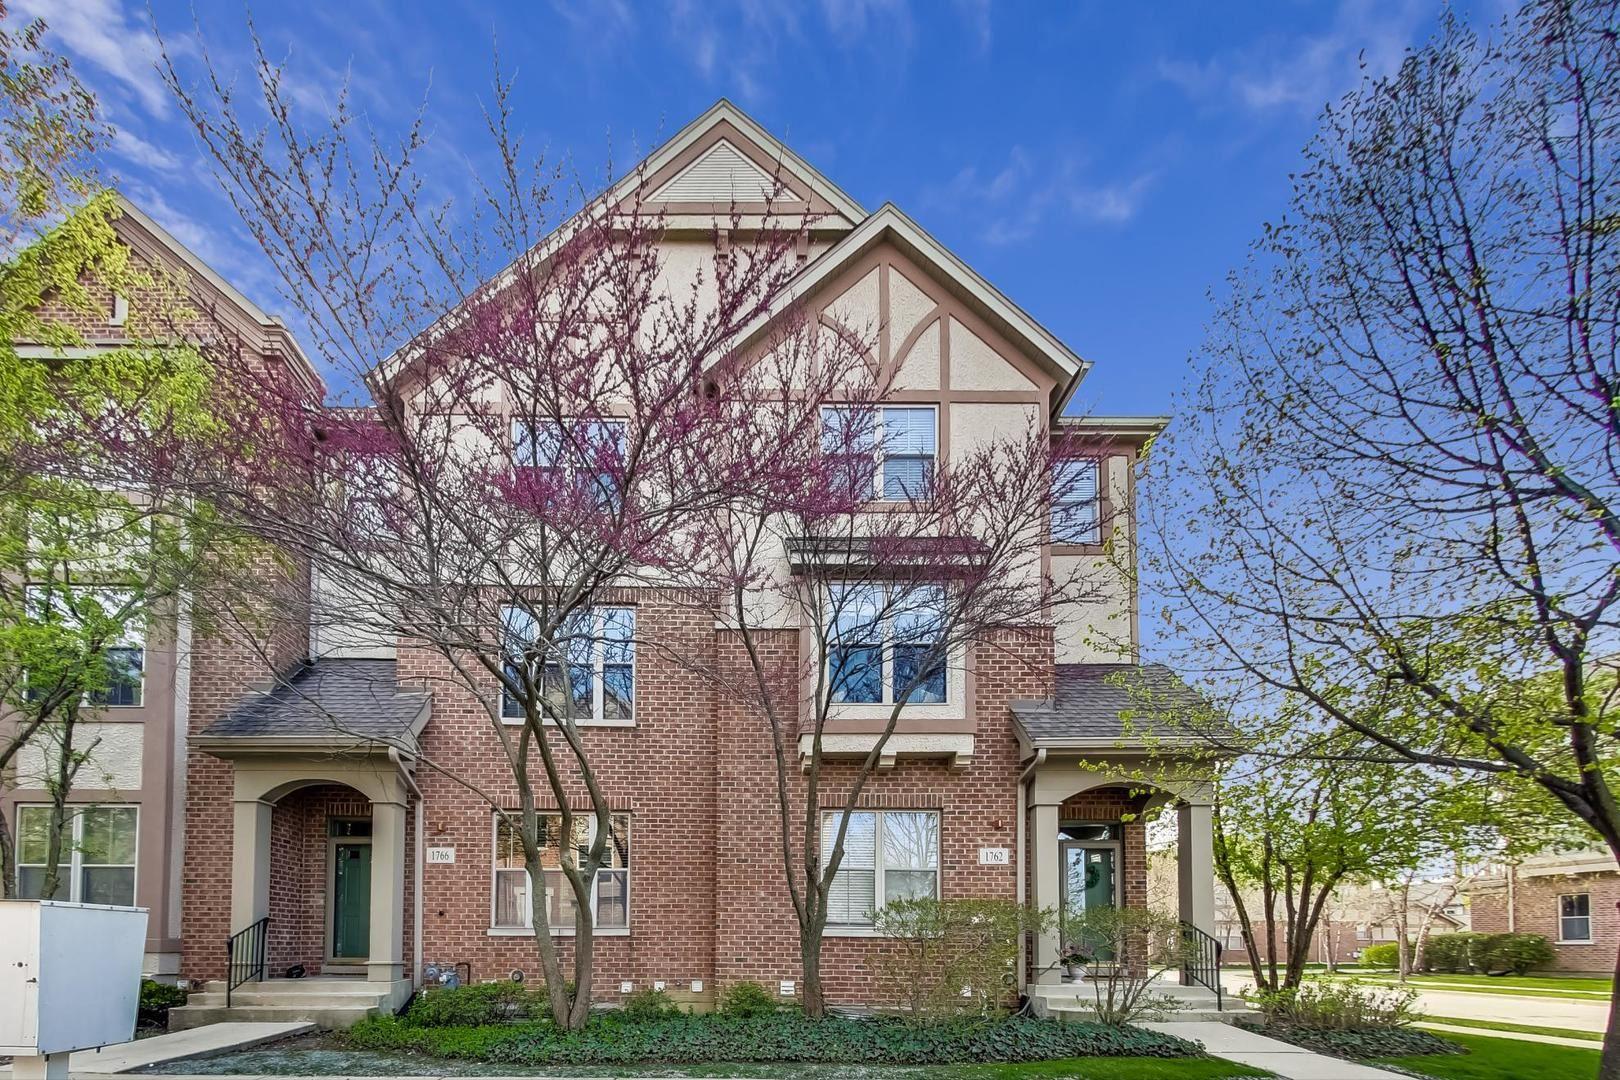 1762 Tudor Lane, Northbrook, IL 60062 - #: 10700547